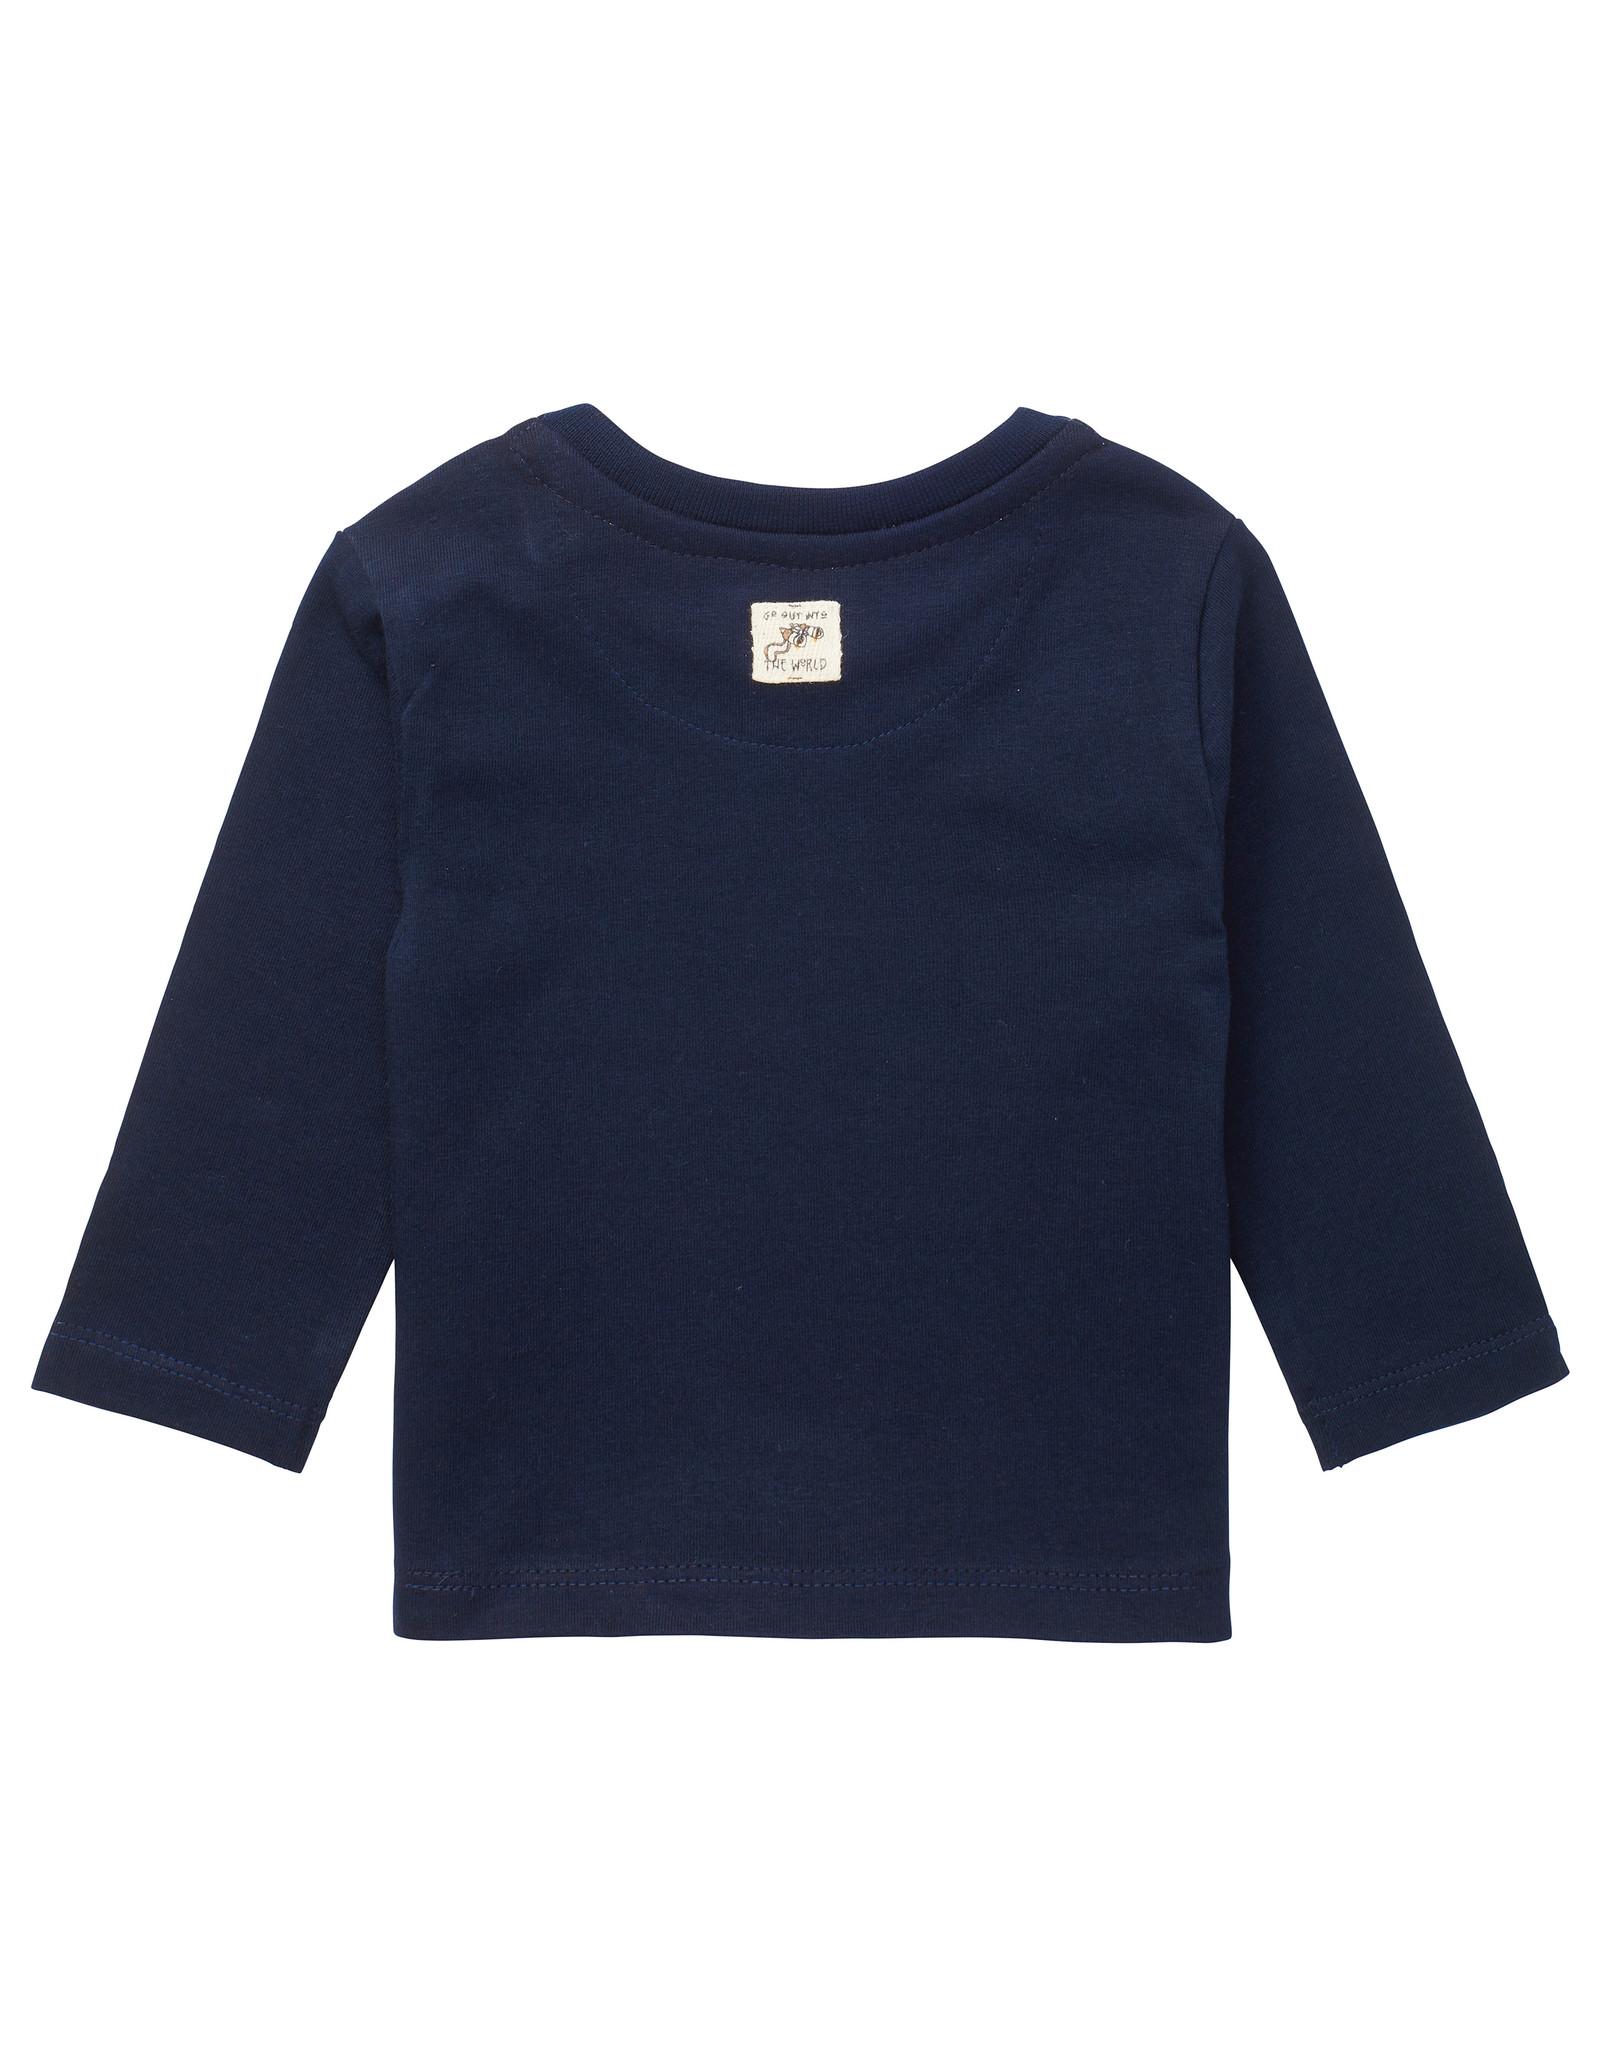 Noppies B T-shirt LS Tring, Dark Sapphire